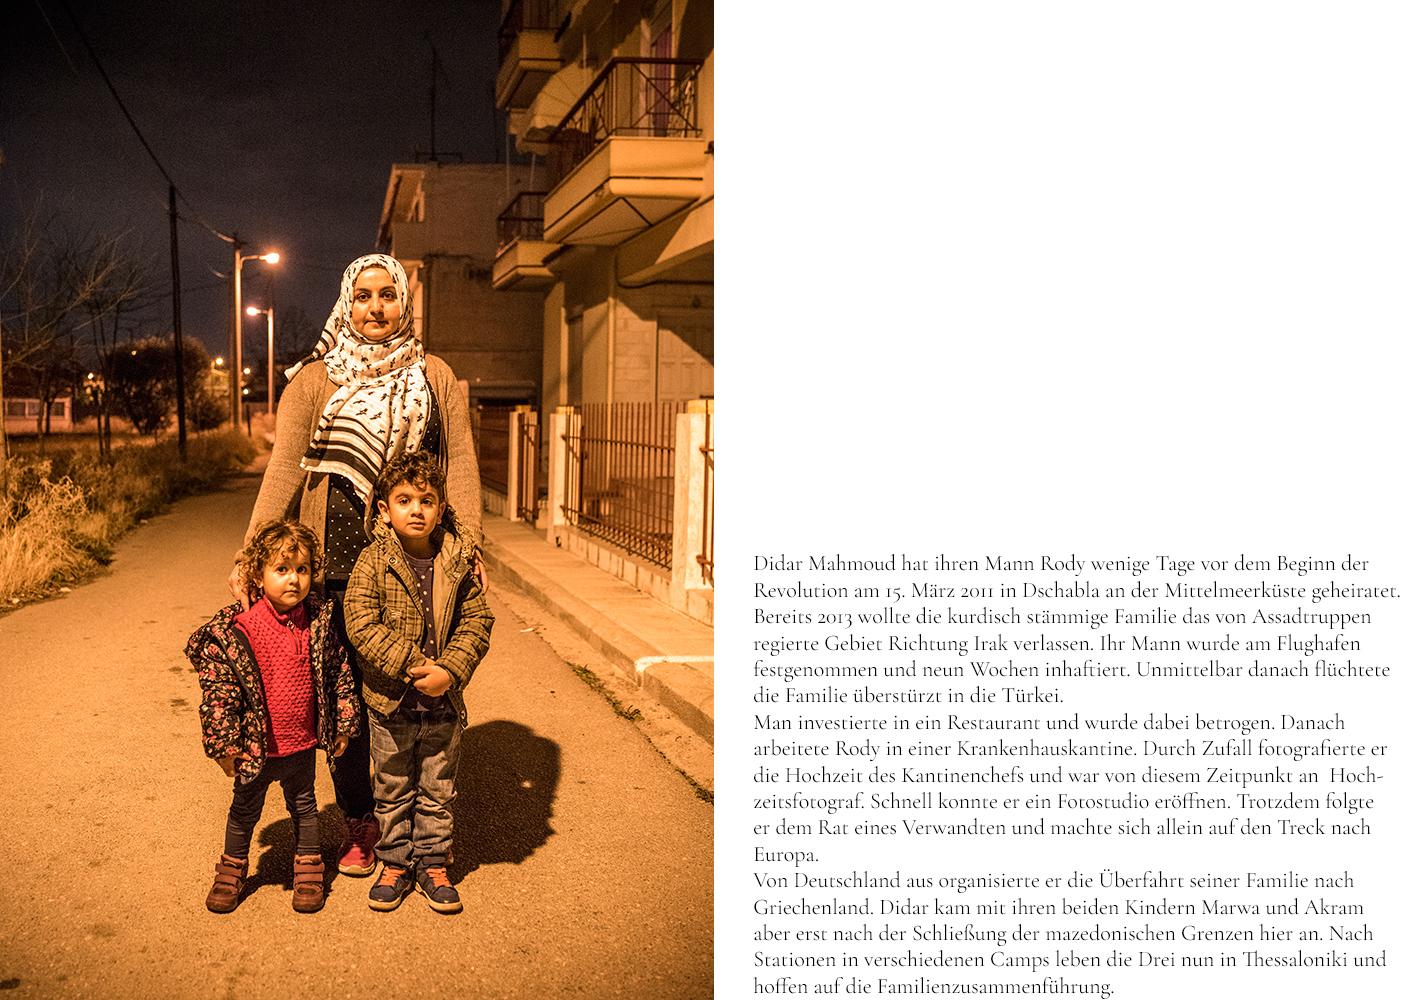 thessaloniki_refugee_matthias_jung_11